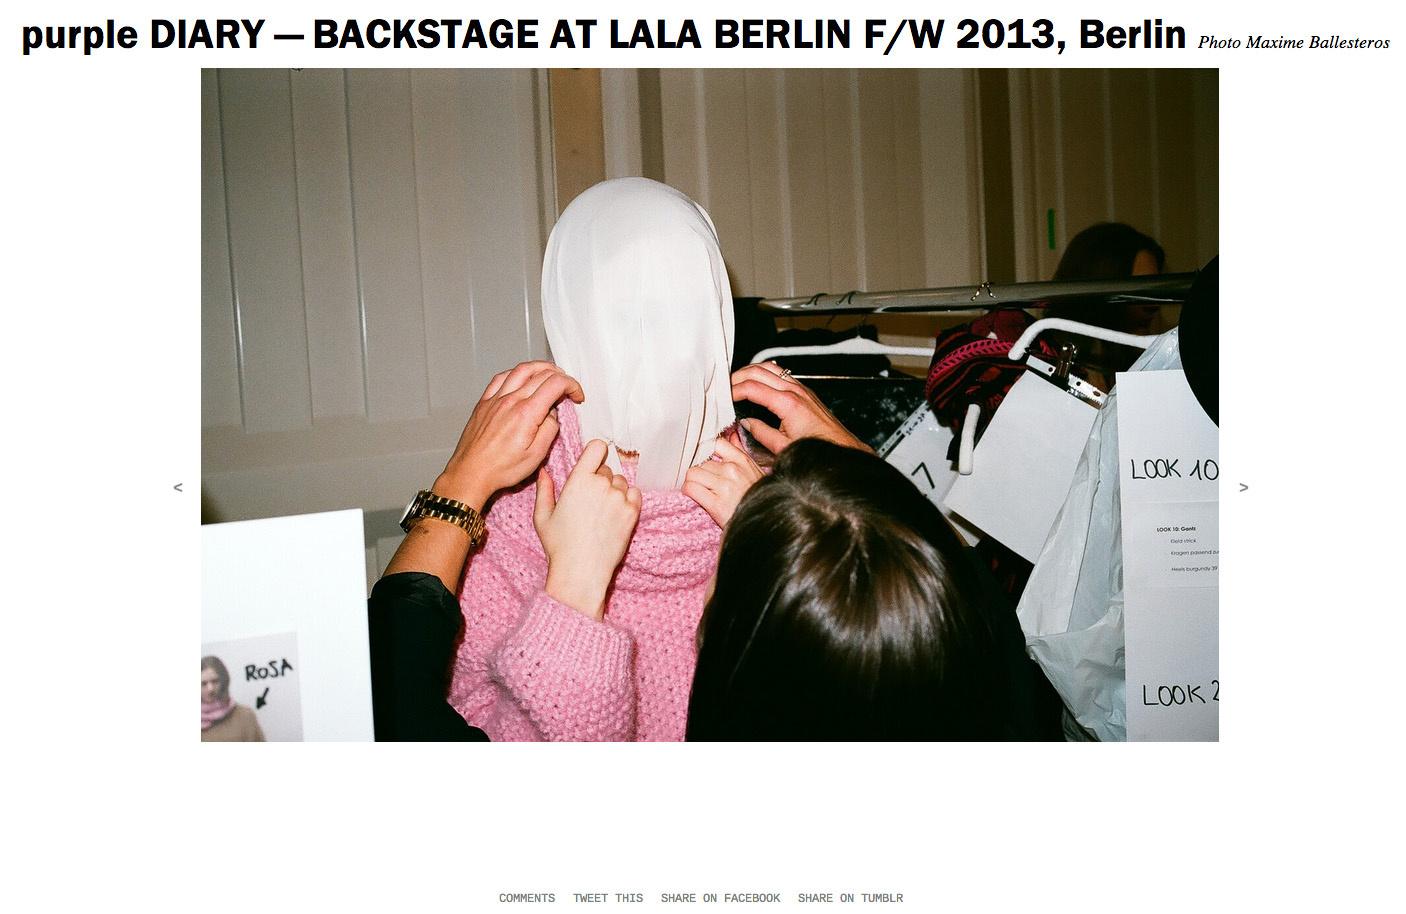 purple DIARY   BACKSTAGE AT LALA BERLIN F W 2013  Berlin.jpg